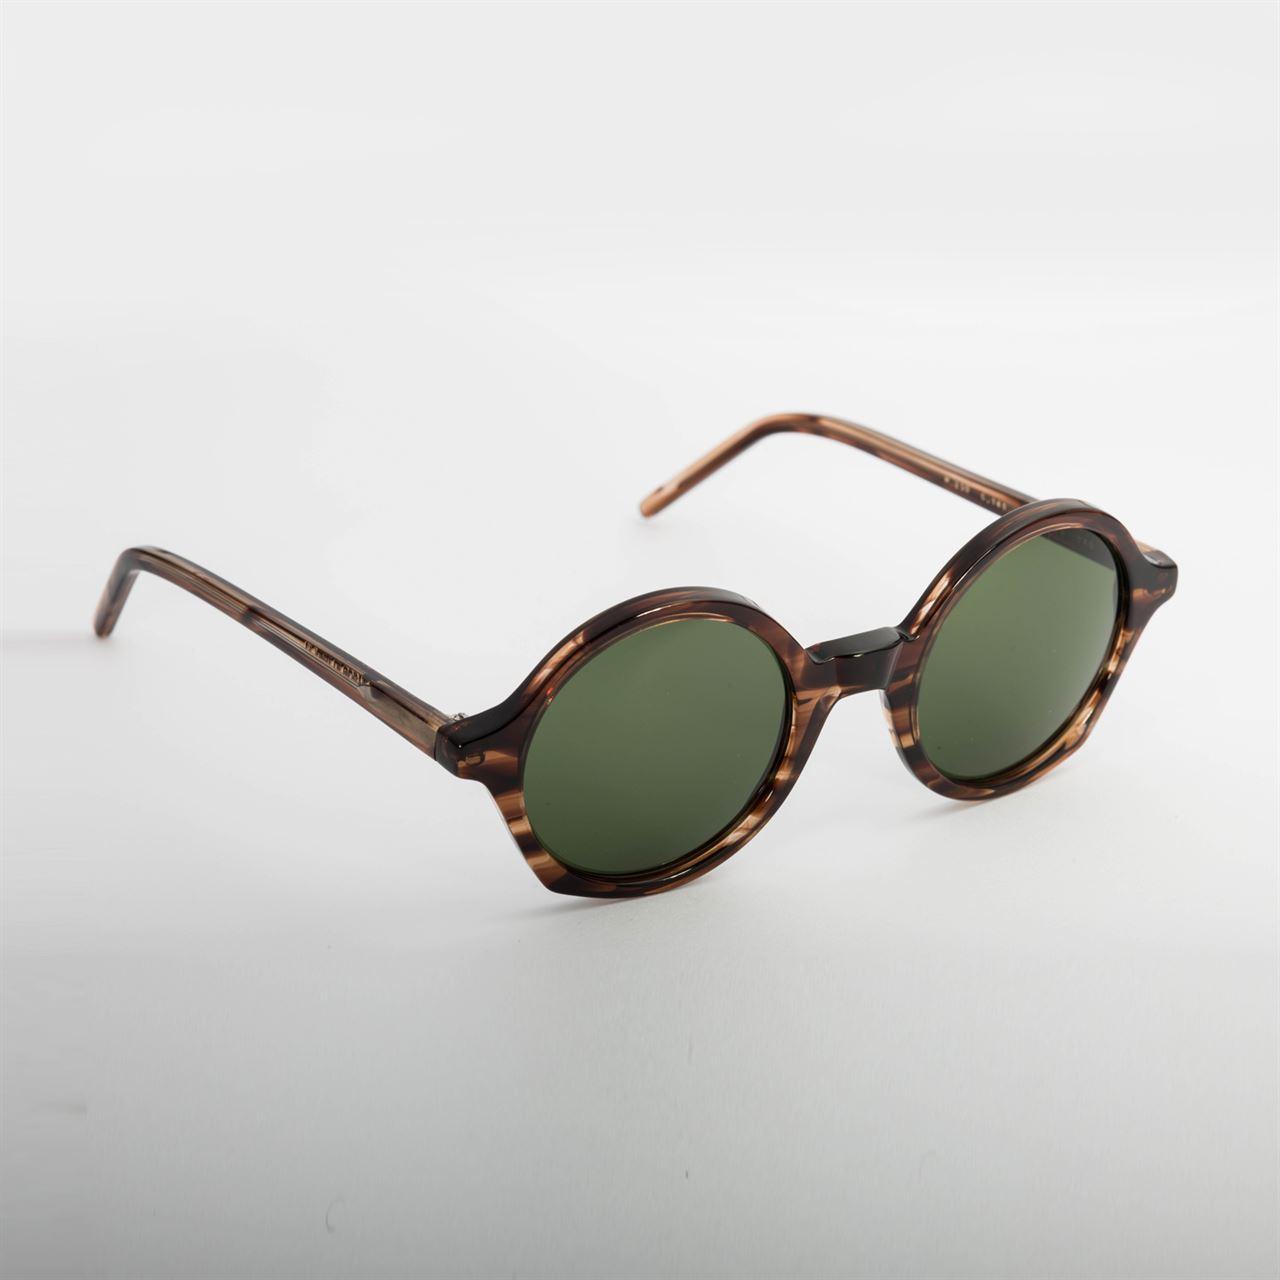 188b0a10fbc Eyewear – sun glasses model 250